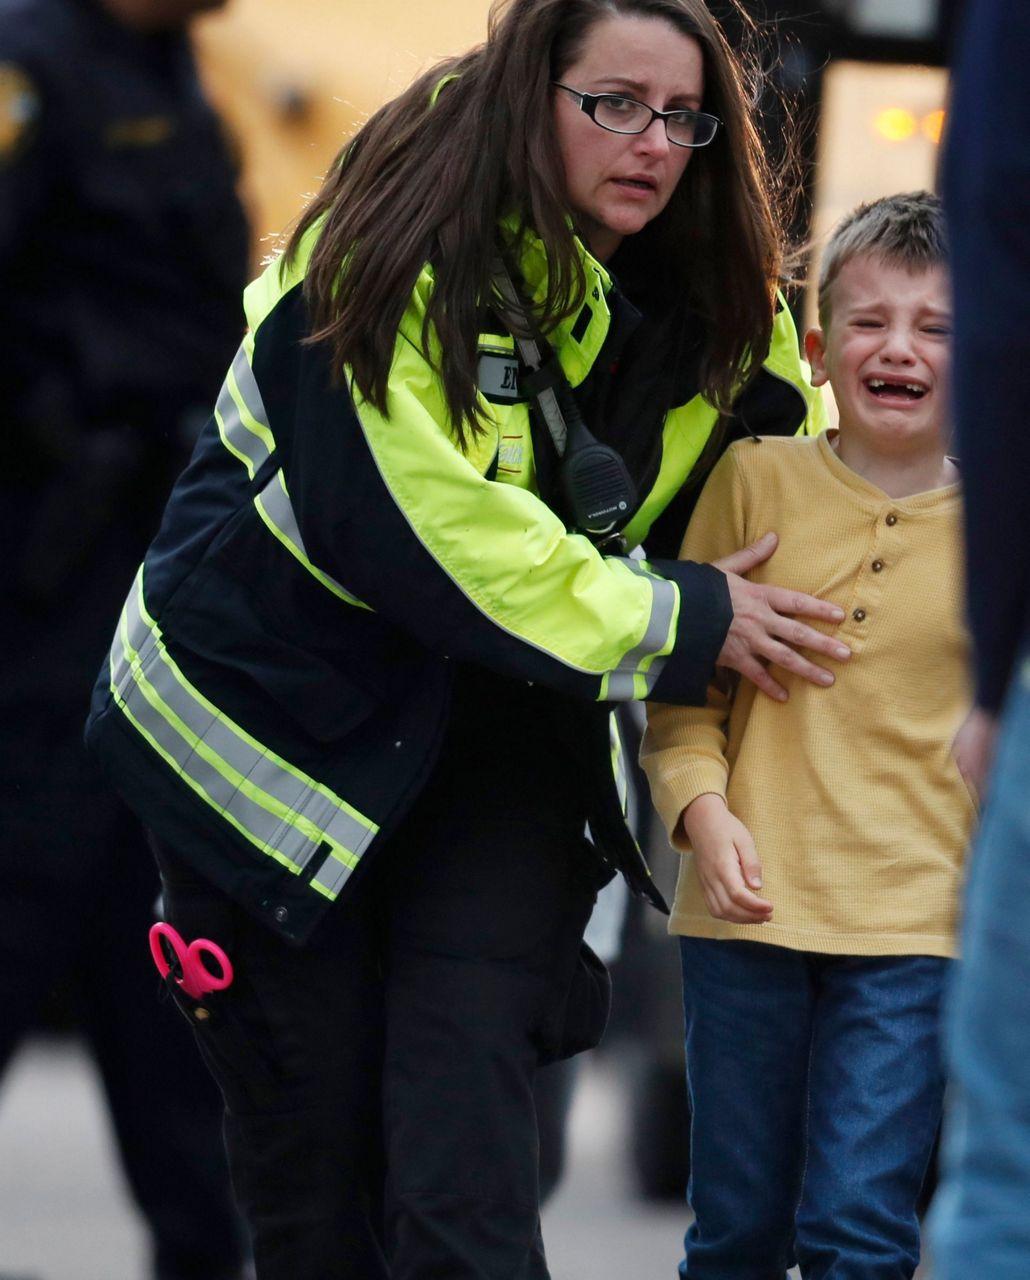 Sheriff: Several Hurt In Suburban Denver School Shooting